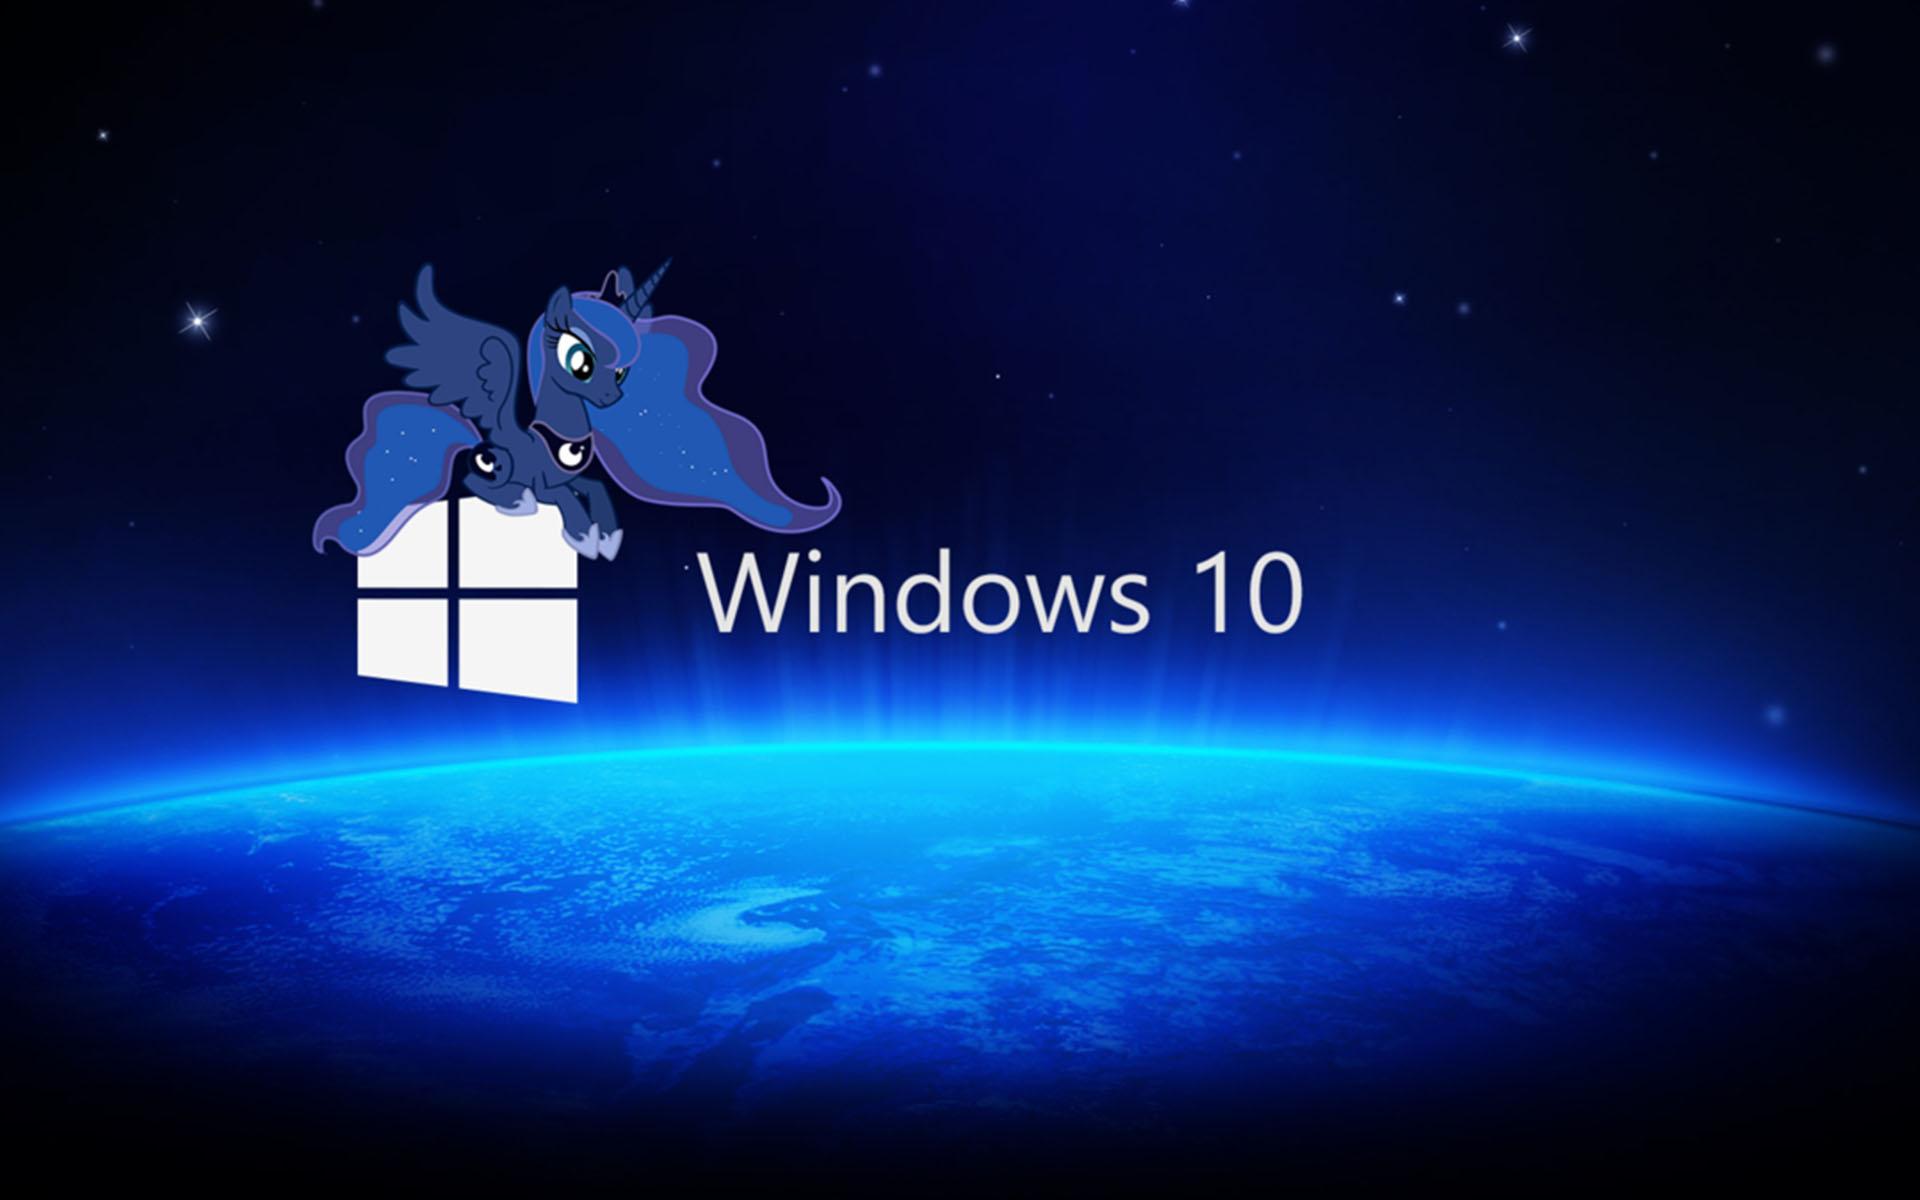 Official windows 10 wallpaper wallpapersafari for Window 10 wallpaper